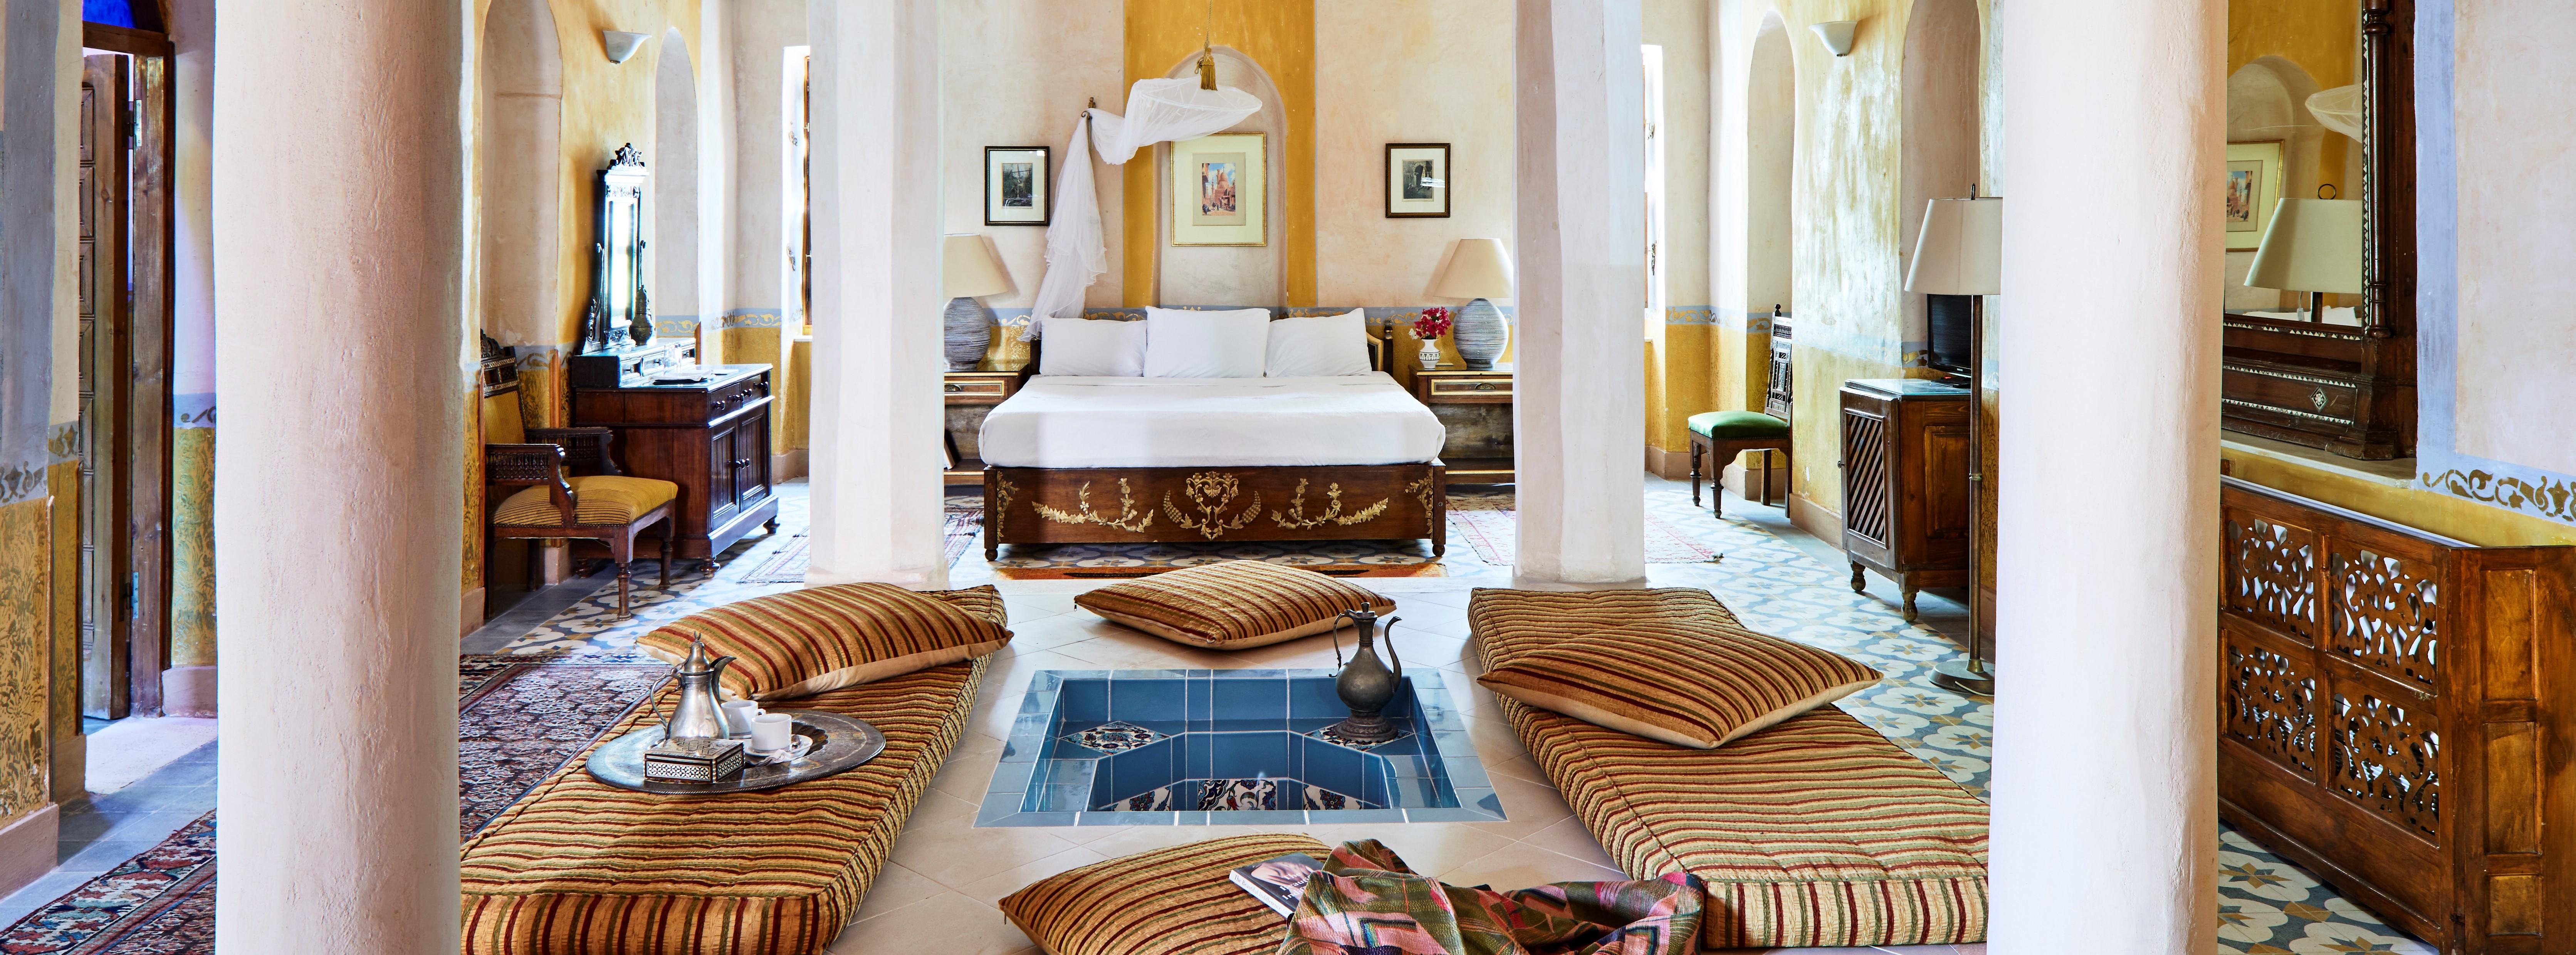 al-moudira-luxor-suite-1